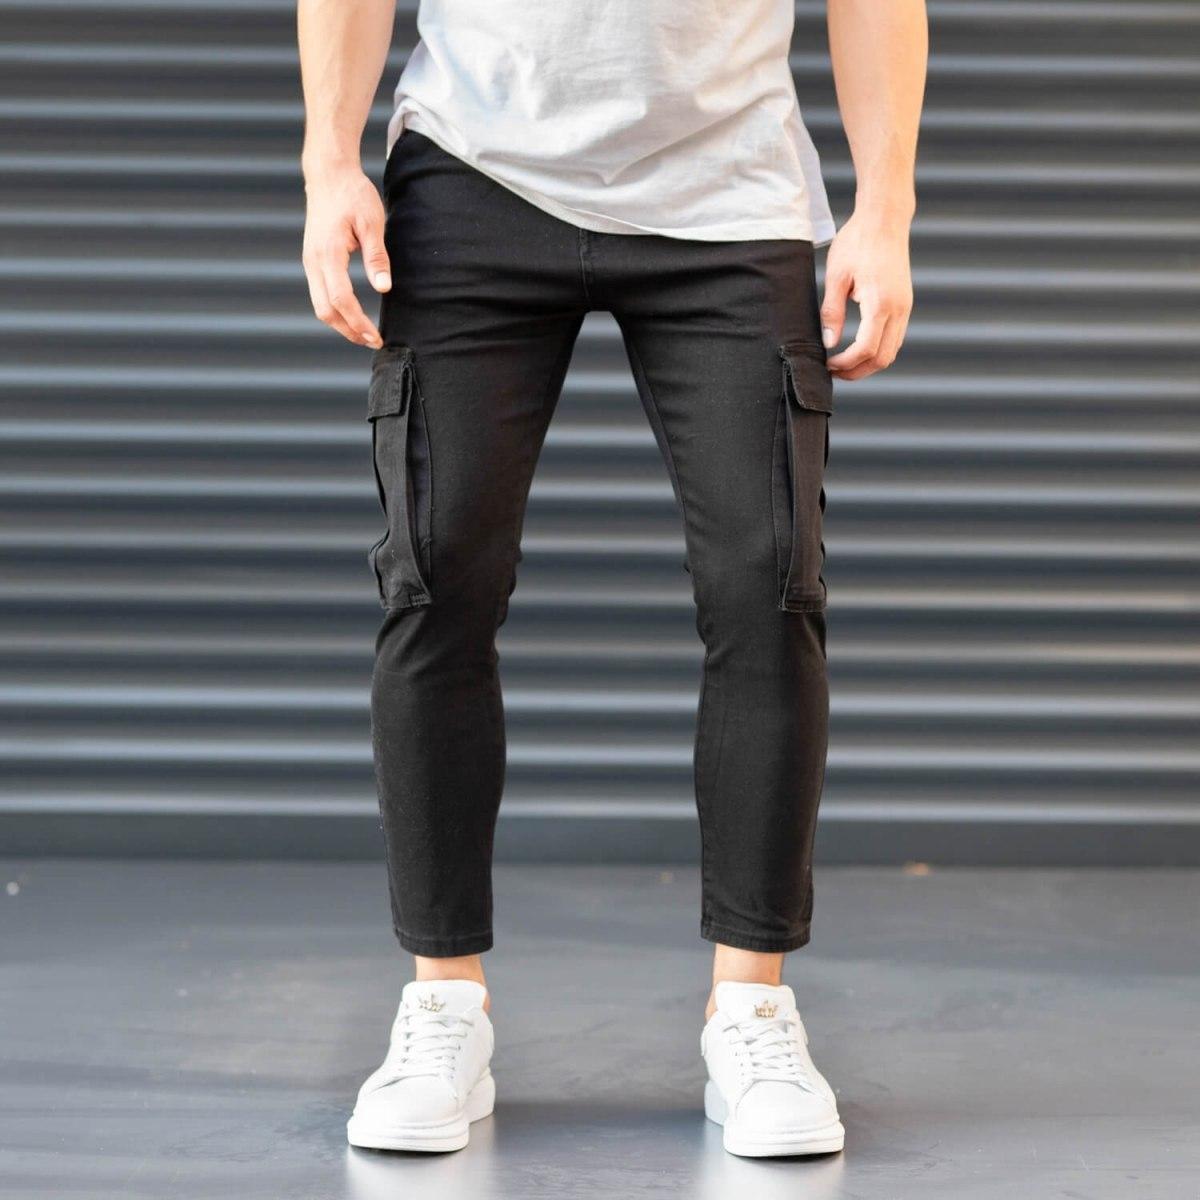 Men's Pocket Style Jeans in...